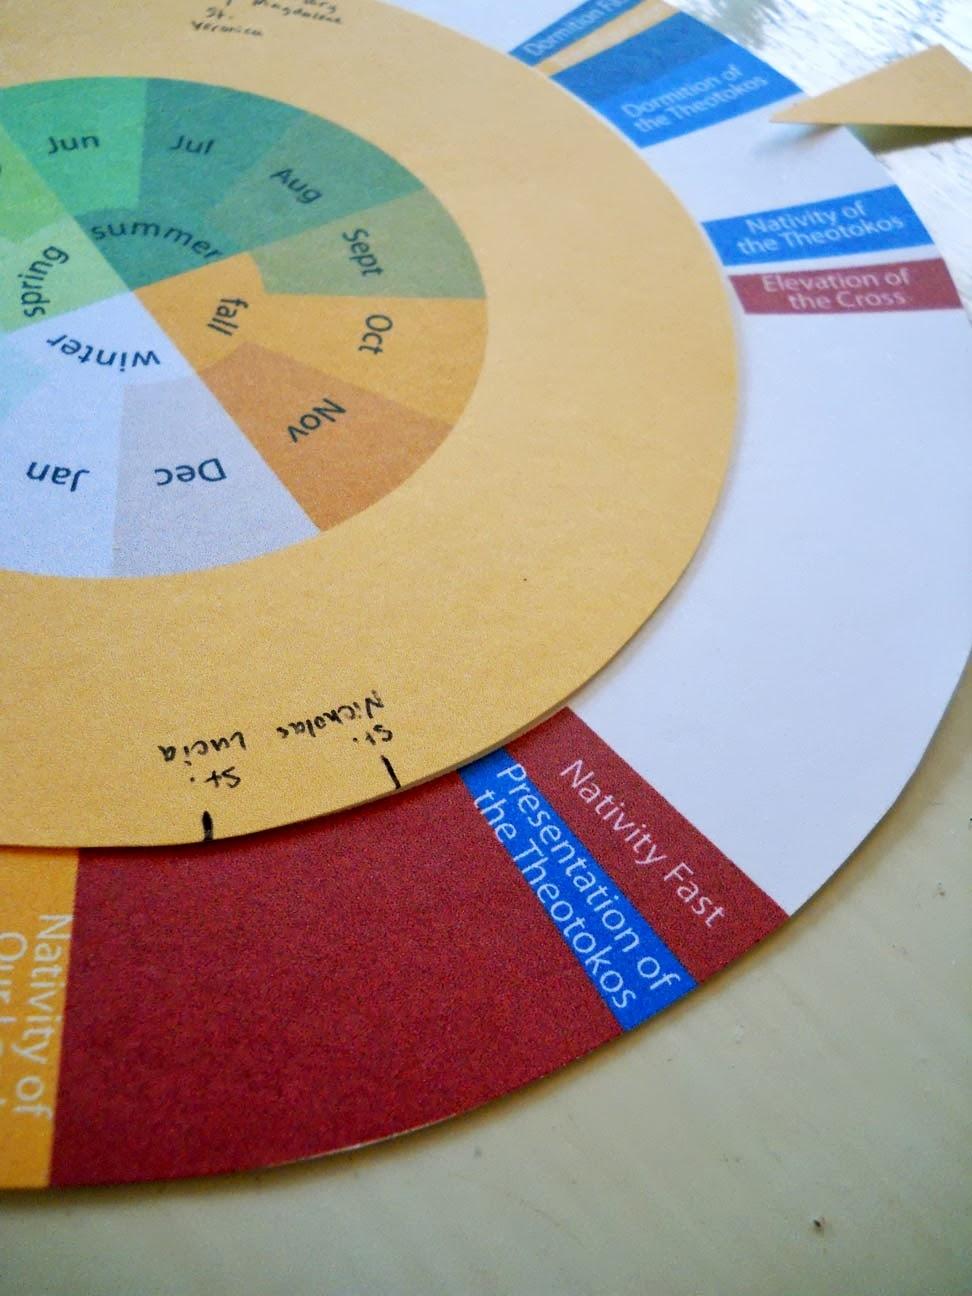 Many Mercies: Church Year - Printable Wheel regarding Wheel Of Church Year Printable For Children